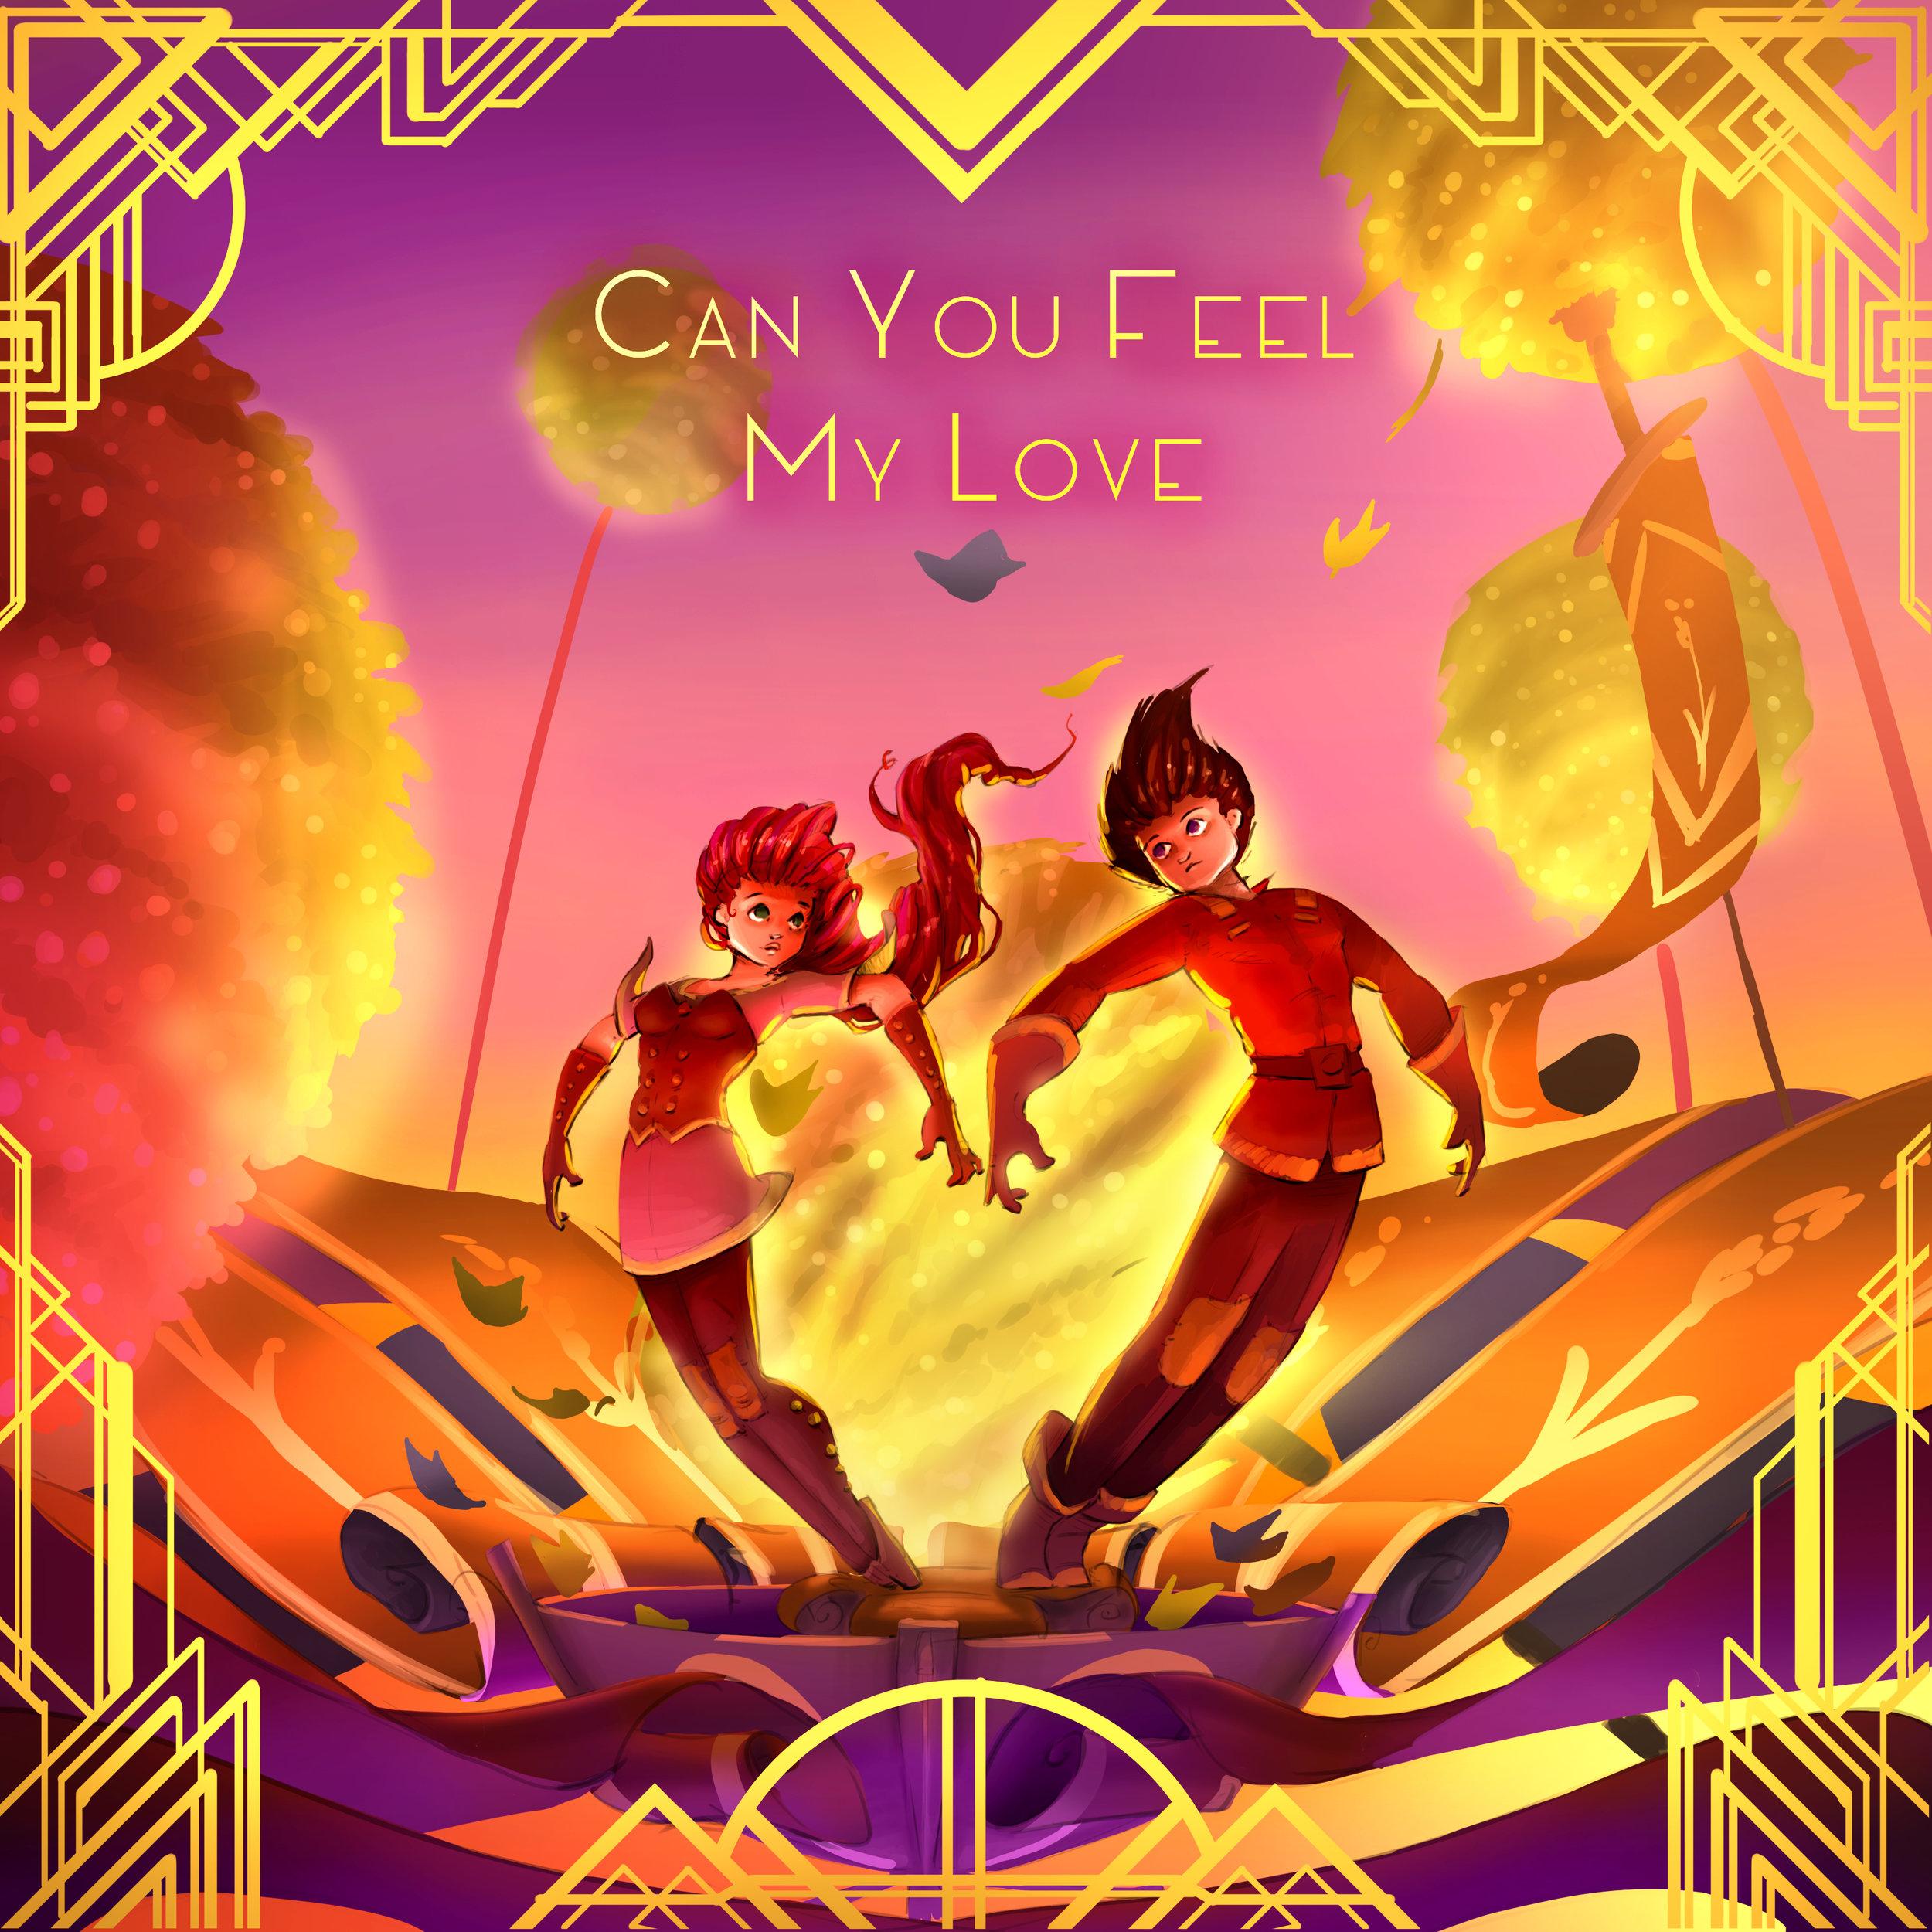 Can You Feel My Love 3300p.jpg